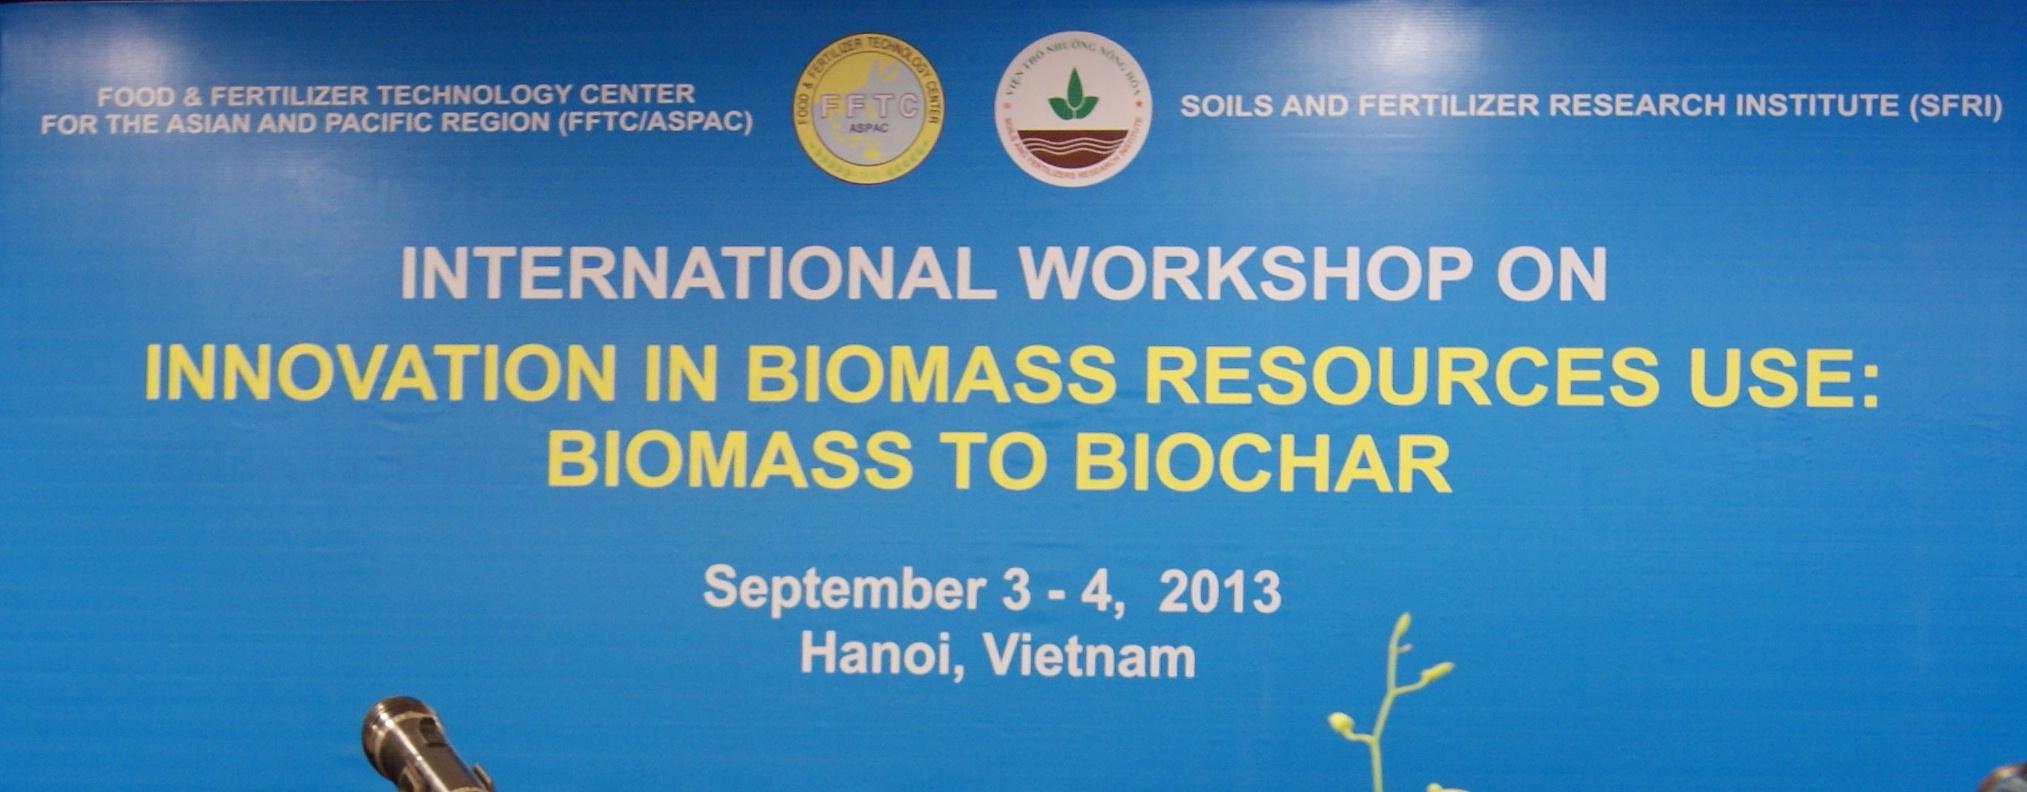 International Workshop on Innovation in Biomass Resources Use: Biomass to Biochar